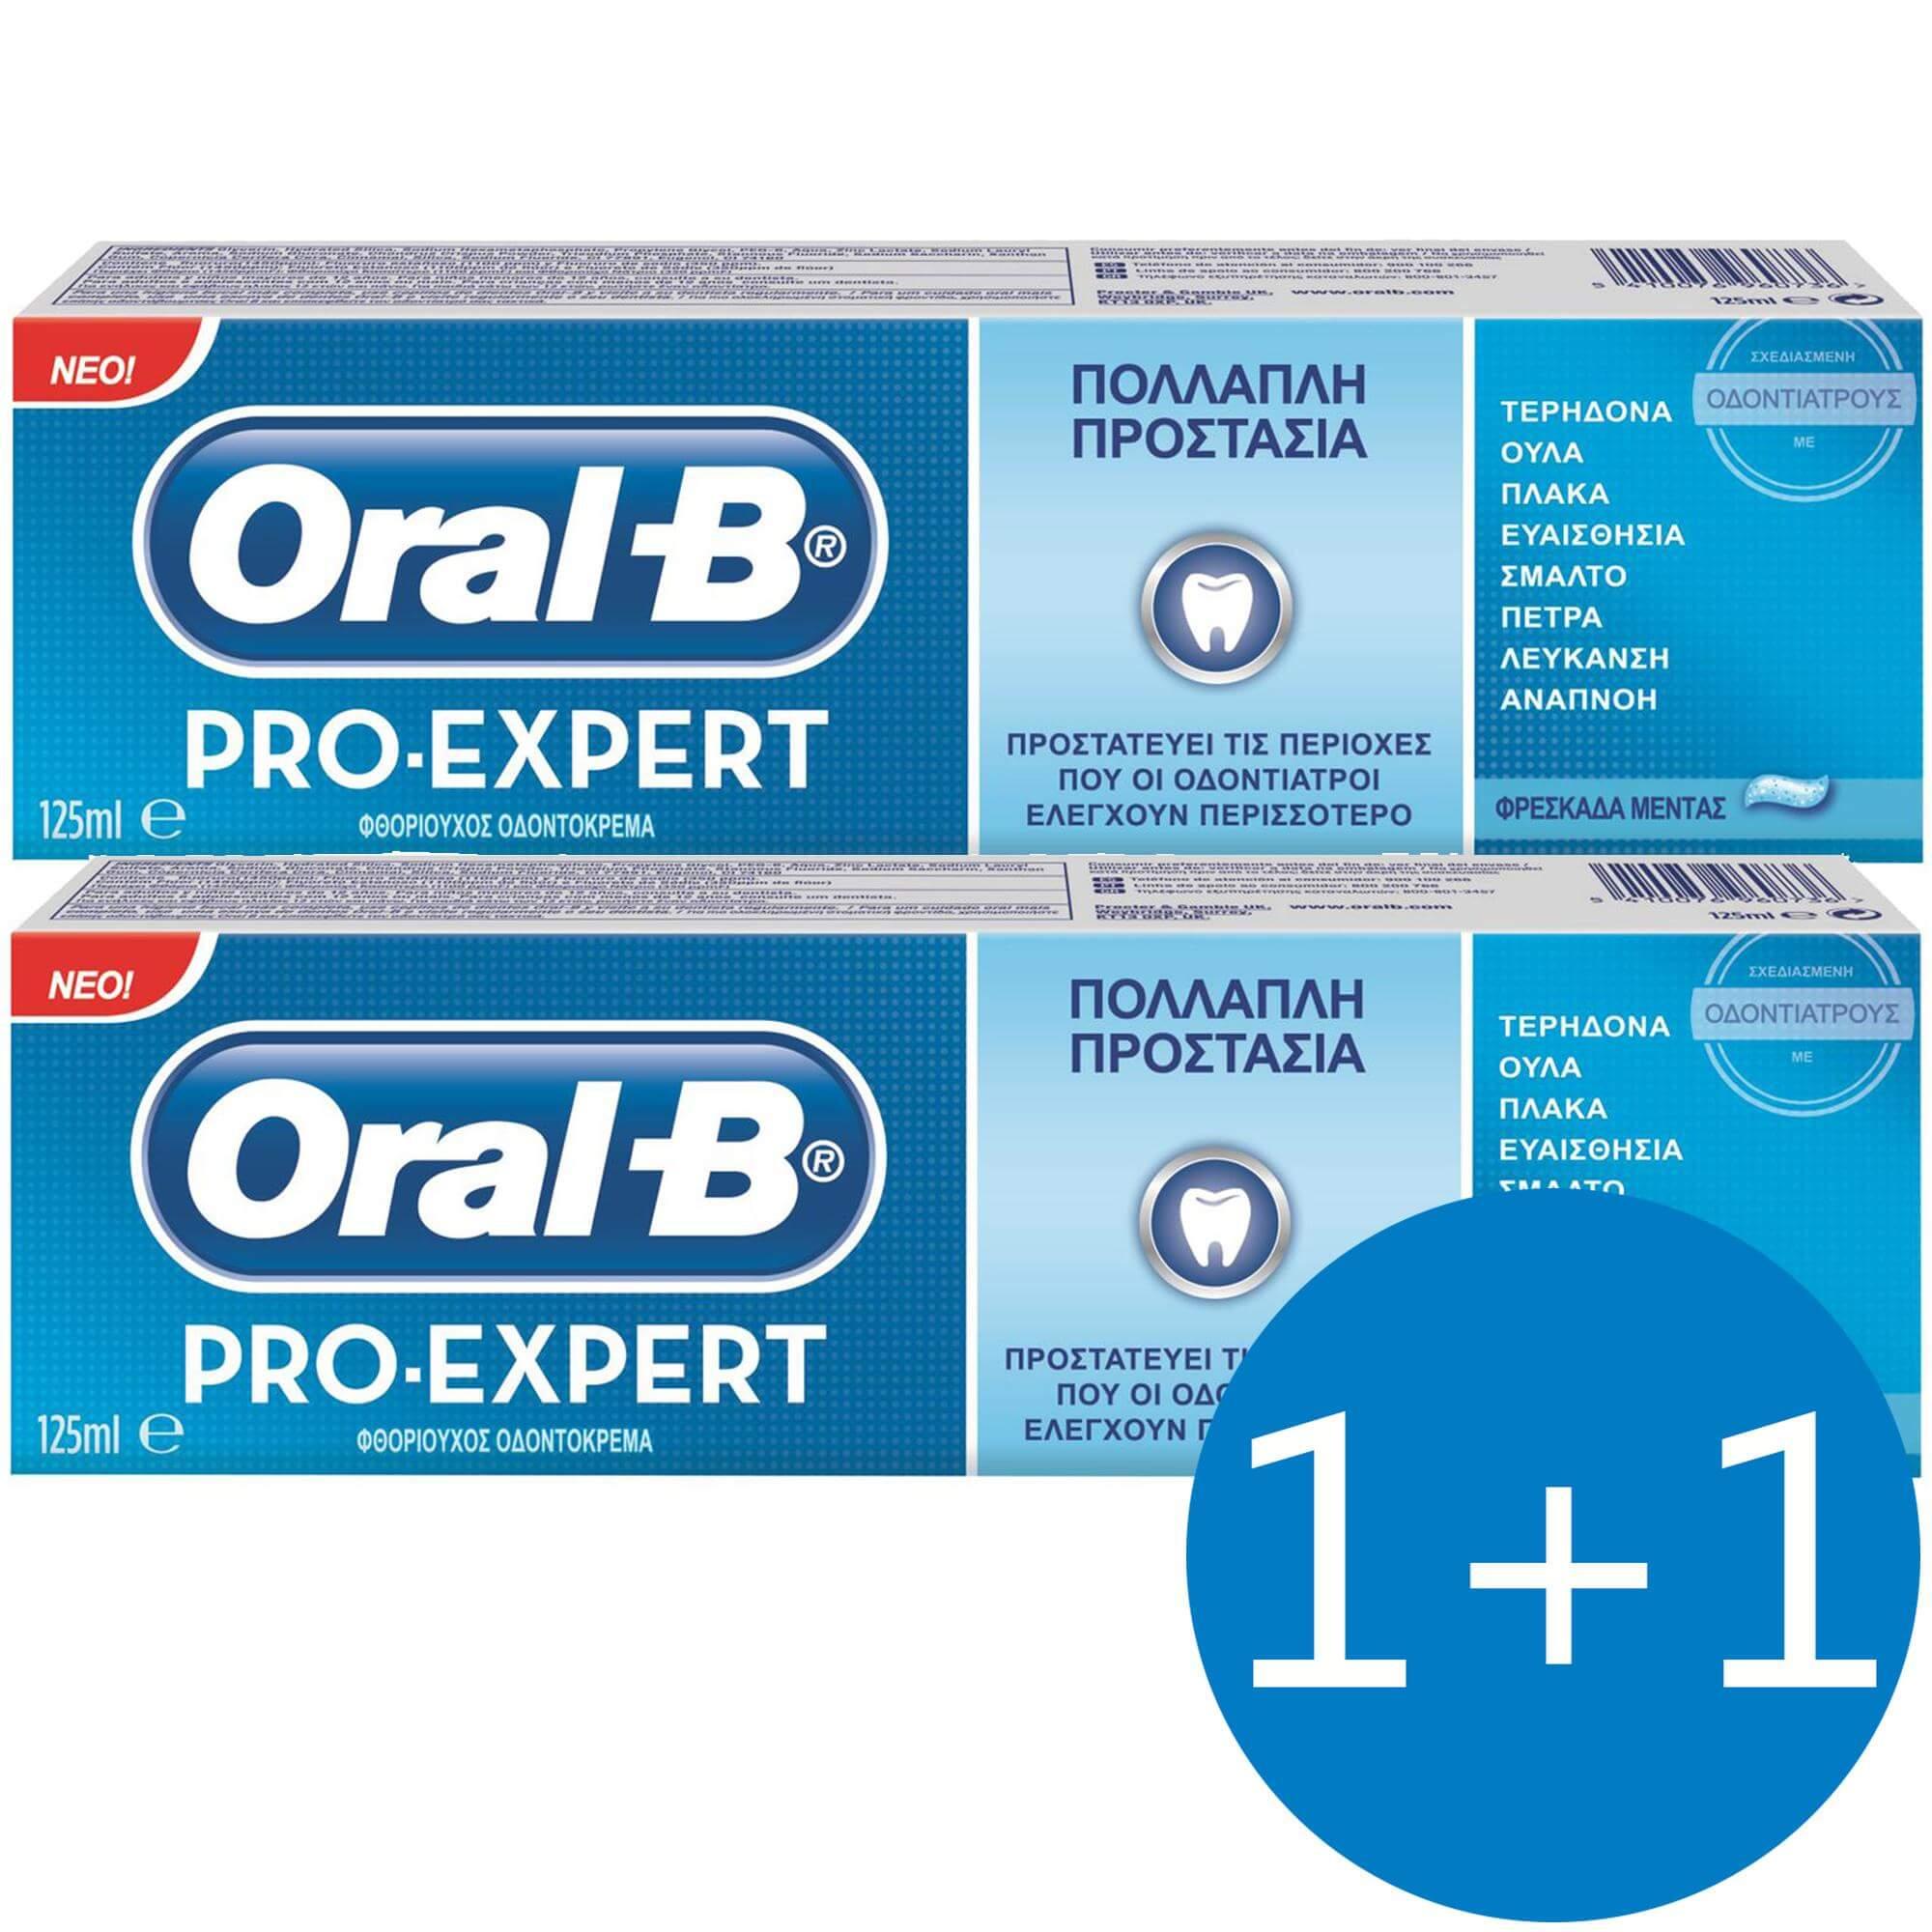 Oral-B Πακέτο Προσφοράς Pro-Expert Οδοντόκρεμα Πολλαπλής Προστασίας με Φρεσκάδα Μέντας 125ml Προσφορά 1+1 Δώρο